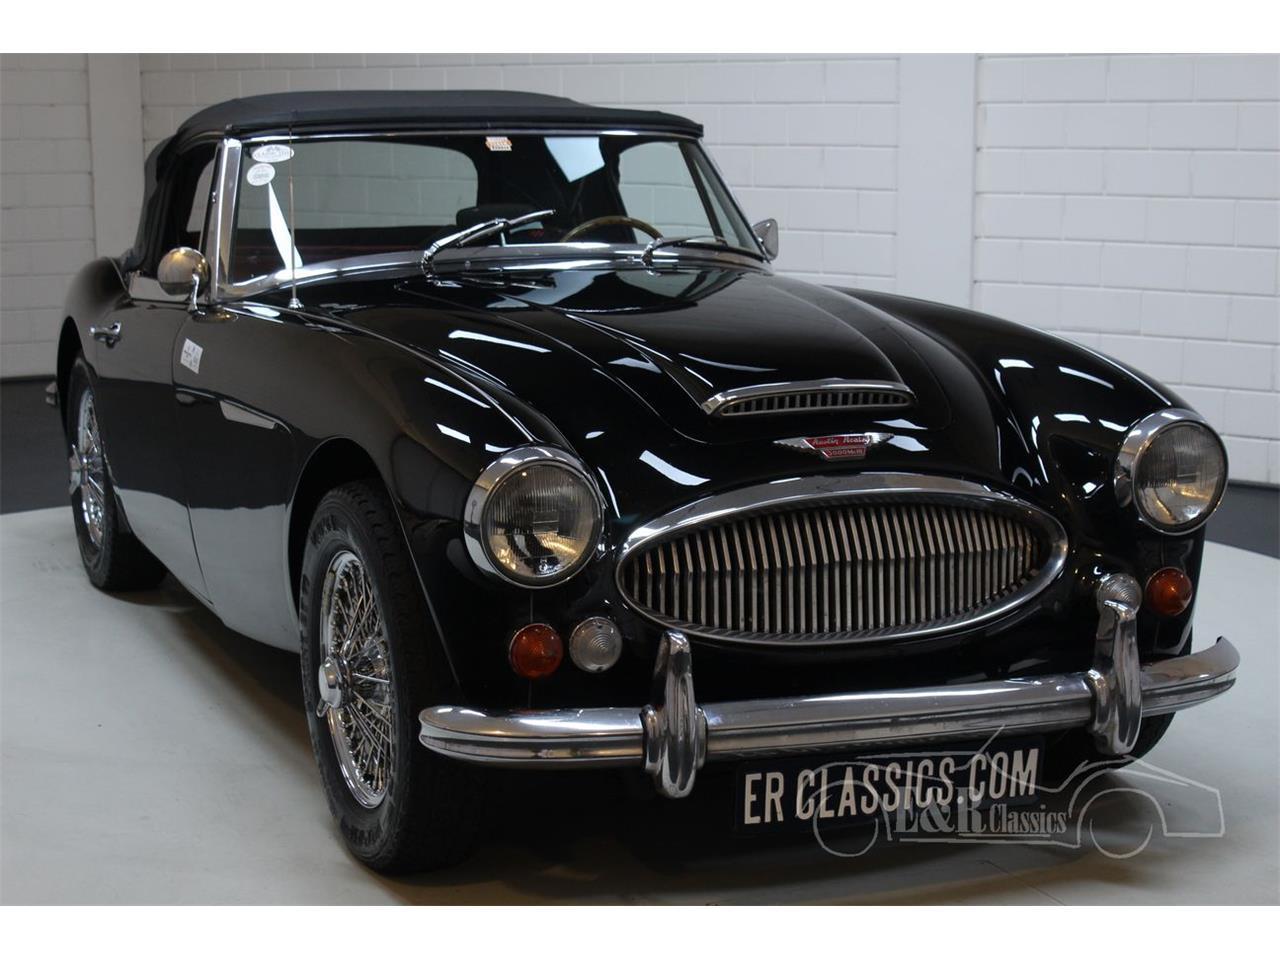 1966 Austin-Healey 3000 Mark III (CC-1319338) for sale in Waalwijk, Noord-Brabant